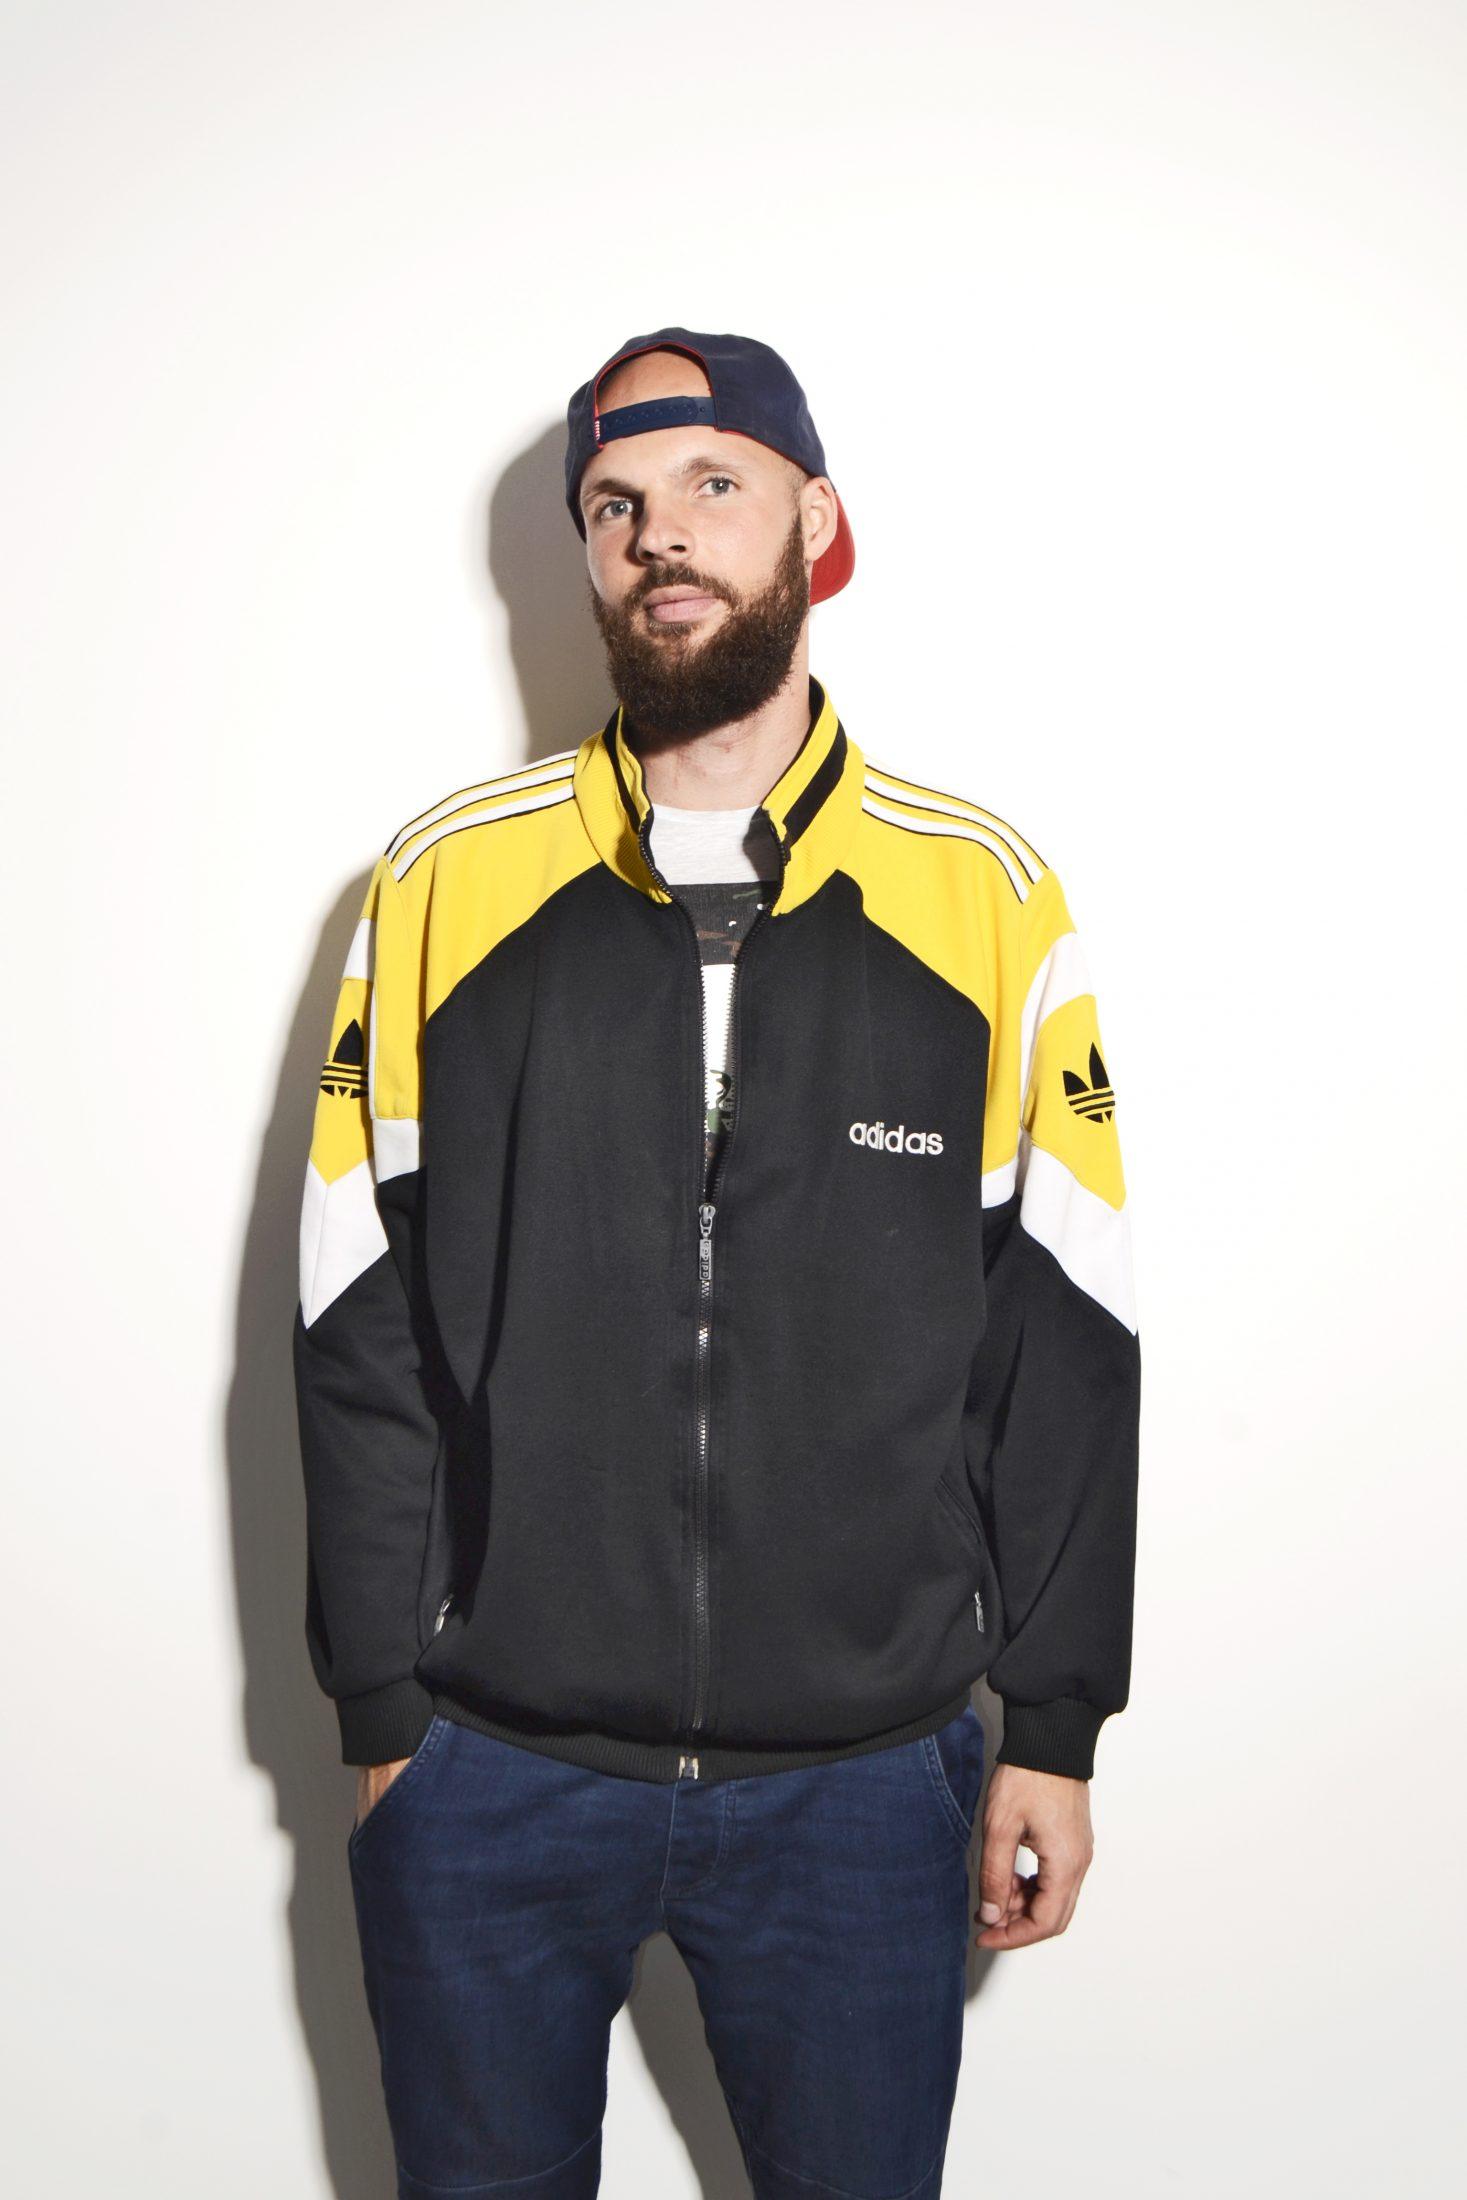 George Stevenson yeso mimar  ADIDAS ORIGINALS 90s jacket | HOT MILK vintage clothing online store